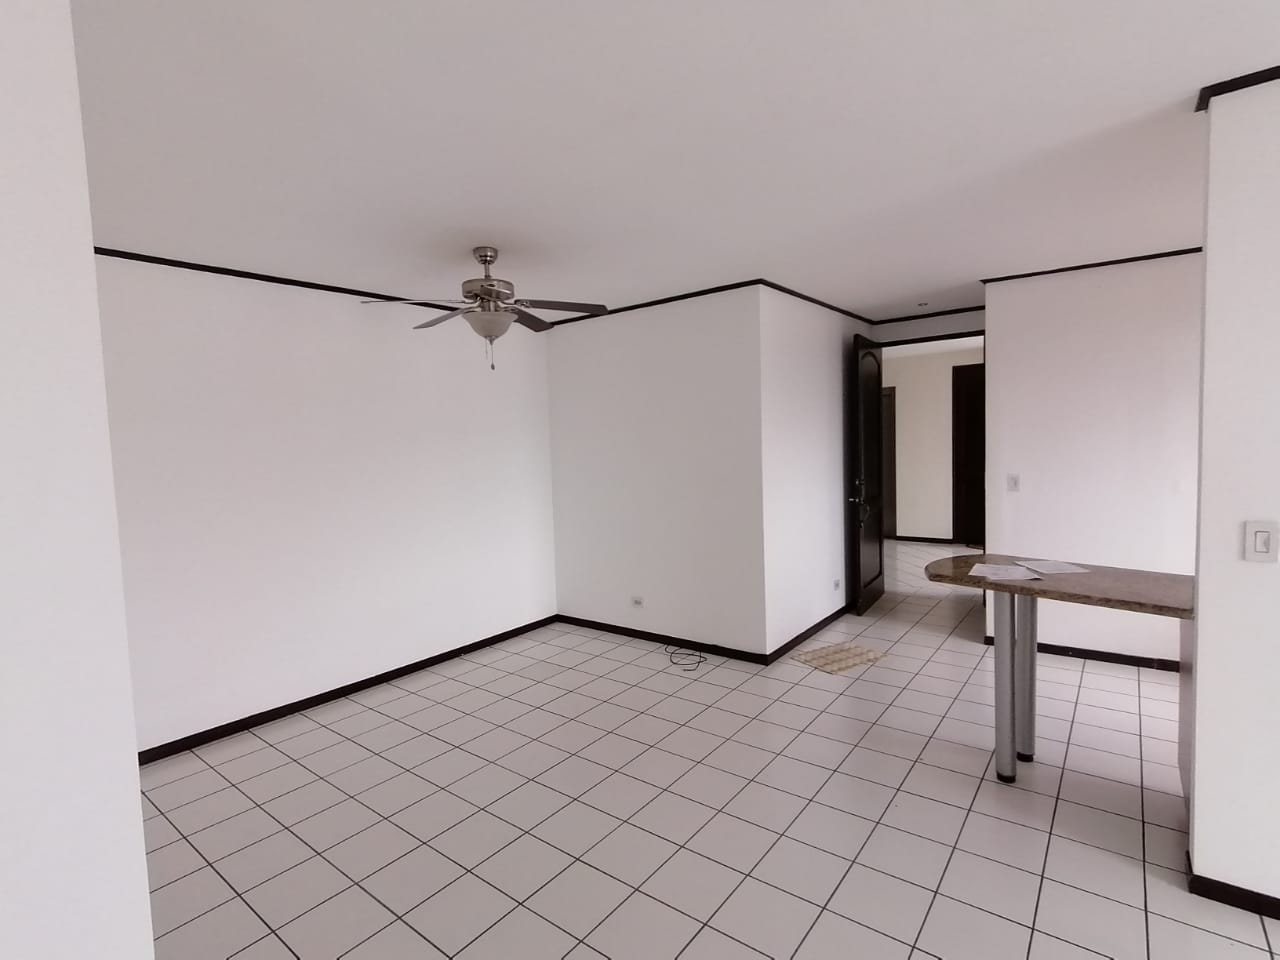 2318 Se Alquila apartamento dentro de condominio en Sabana Oeste